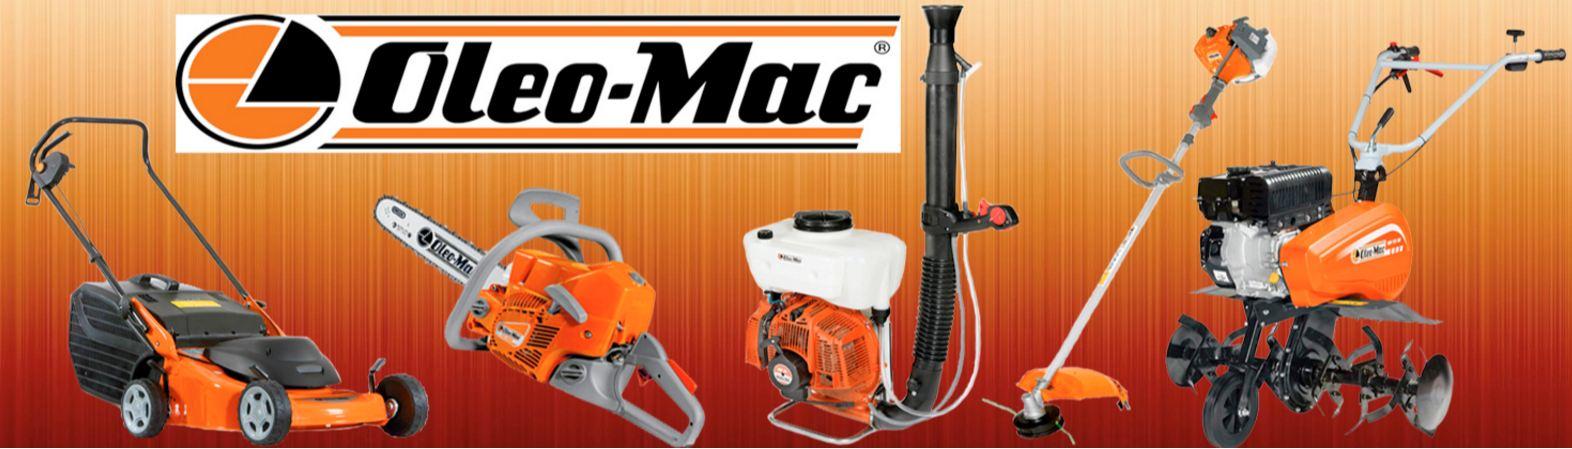 Техническое-обслуживание-и-ремонт-мотопомп-Oleo-Mac